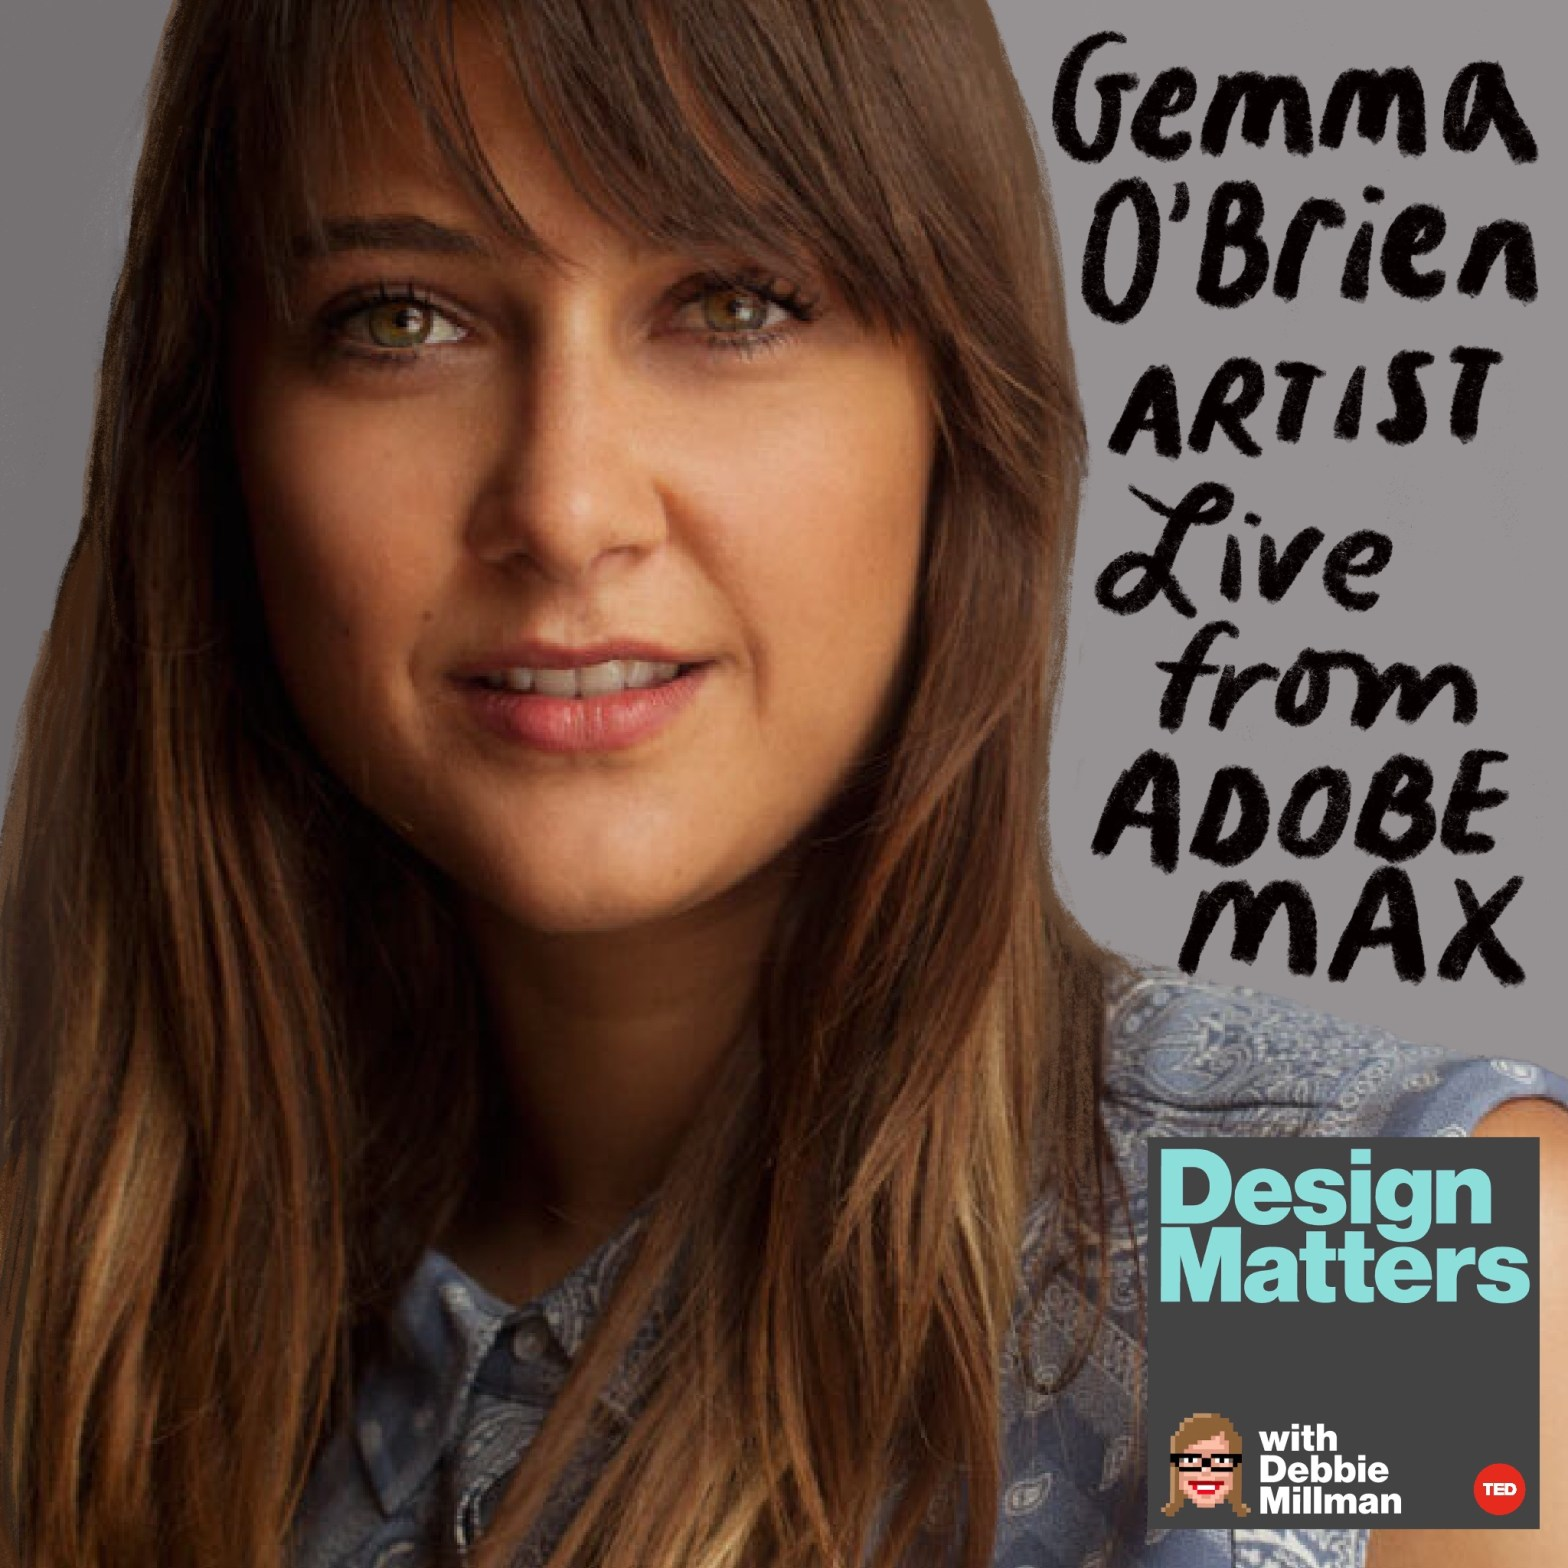 Thumbnail for Design Matters Live: Gemma O'Brien